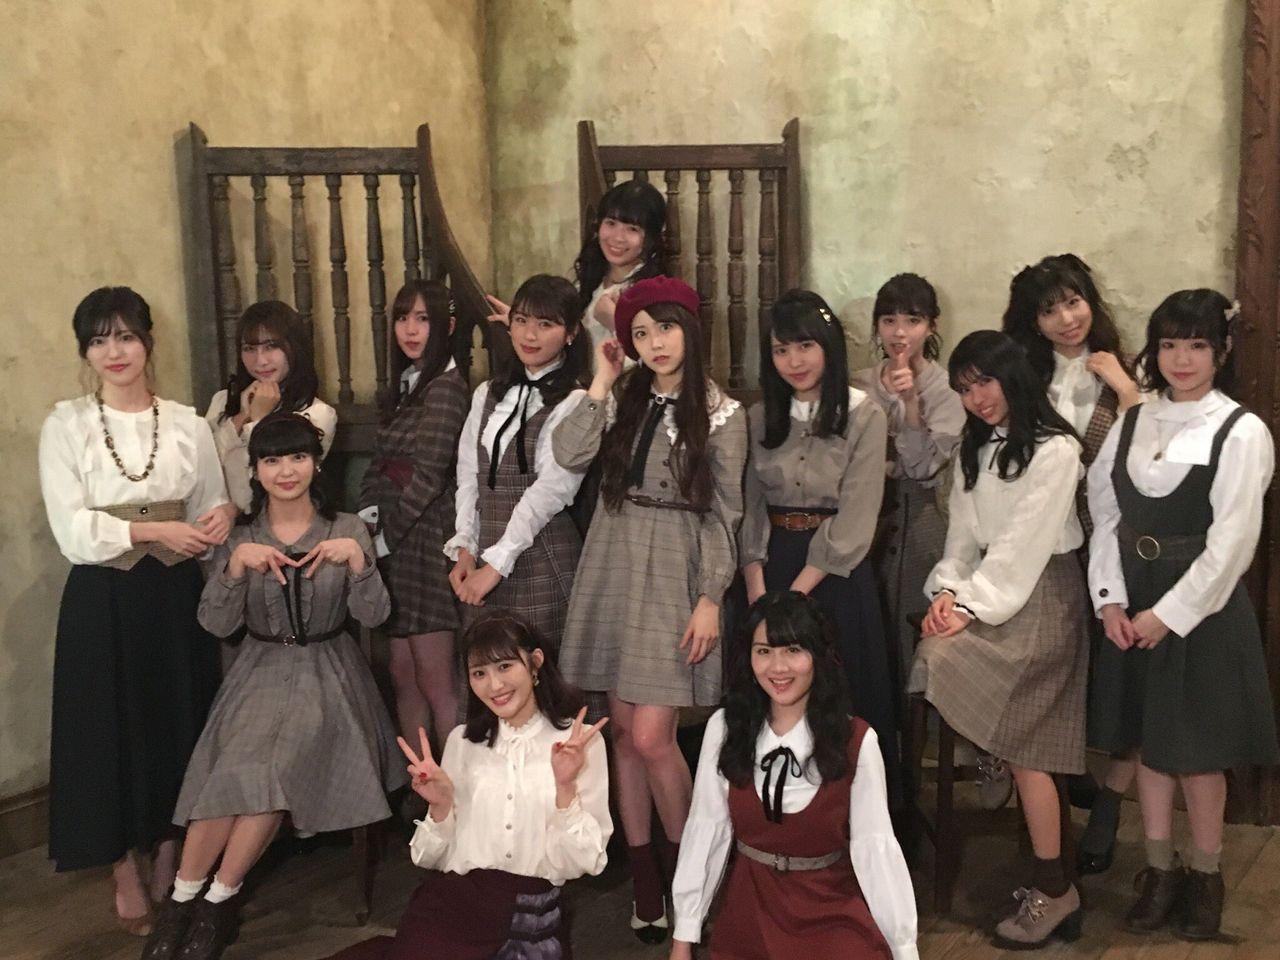 【NMB48】新チーム曲 MV公開キタ━━━━(゚∀゚)━━━━!!序列は?ファンの反応は?